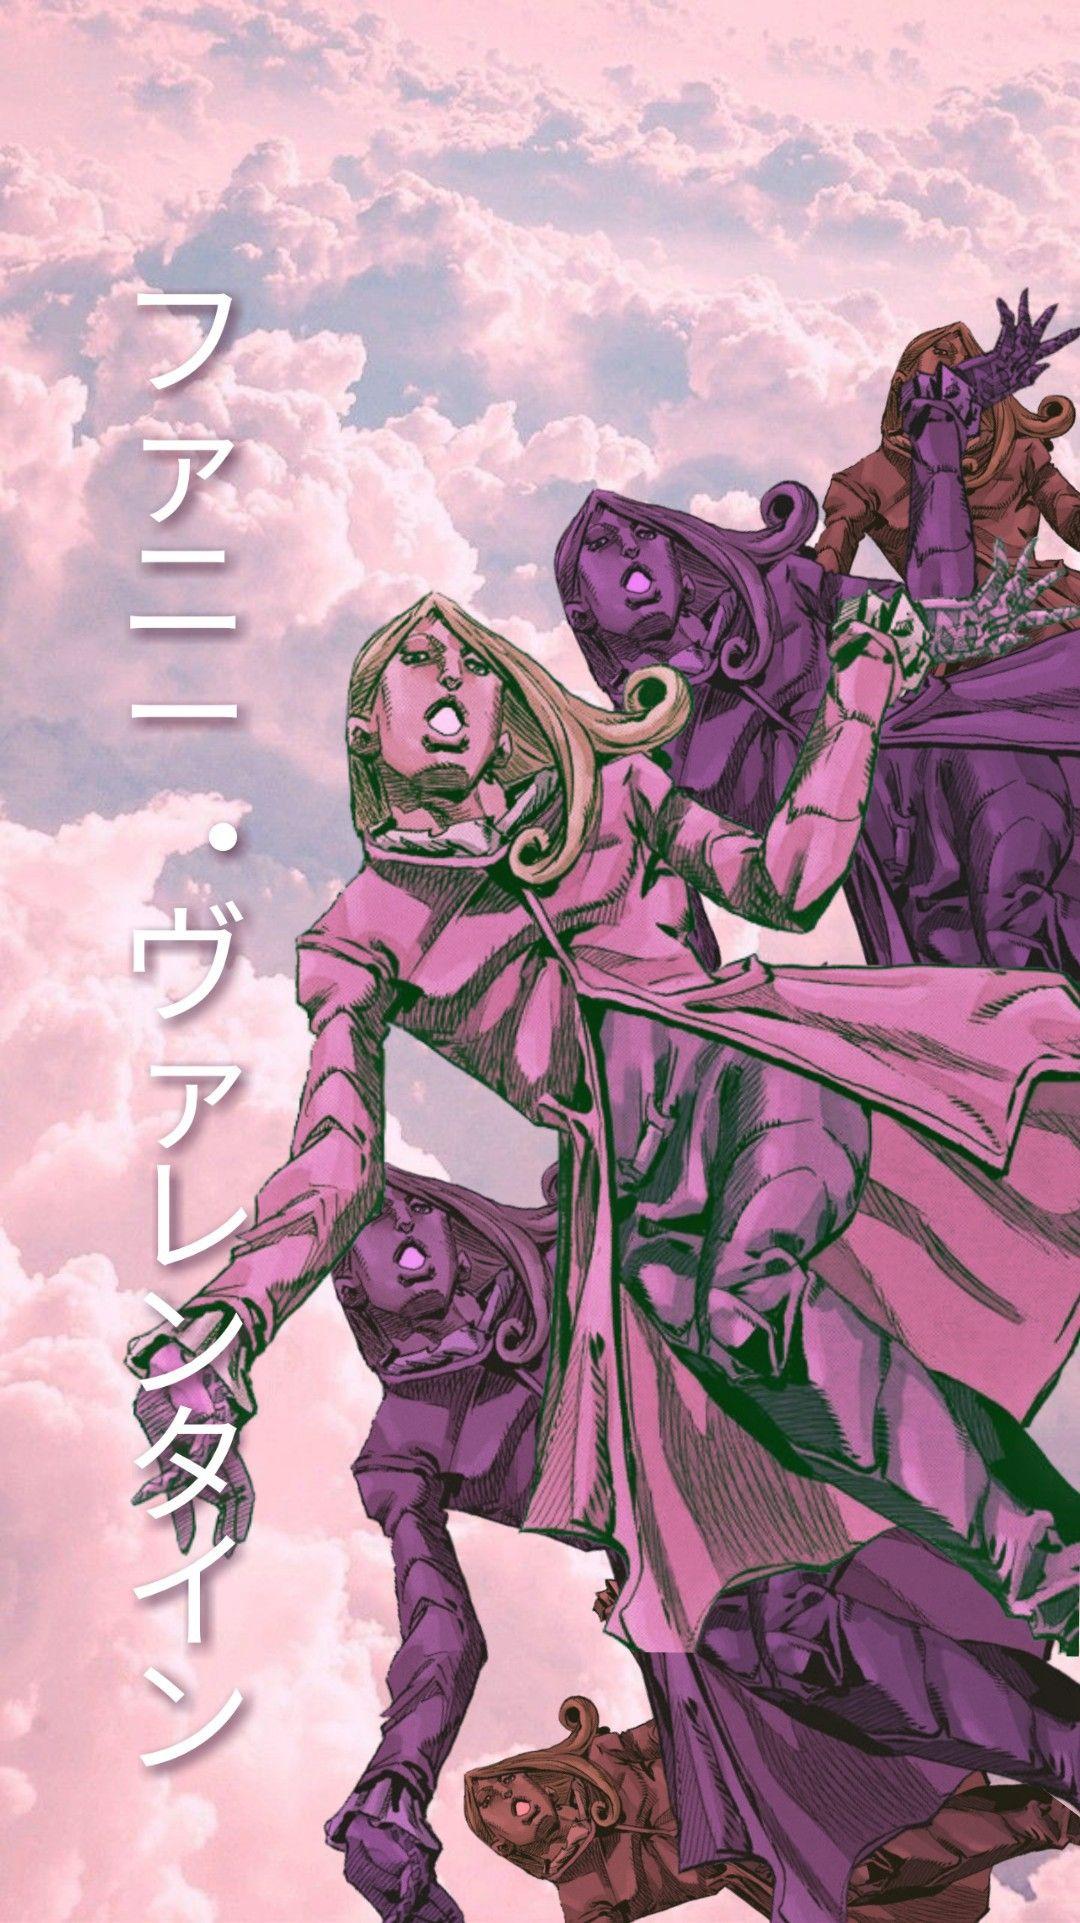 Funny Valentine wallpaper  Jojo anime, Valentines wallpaper